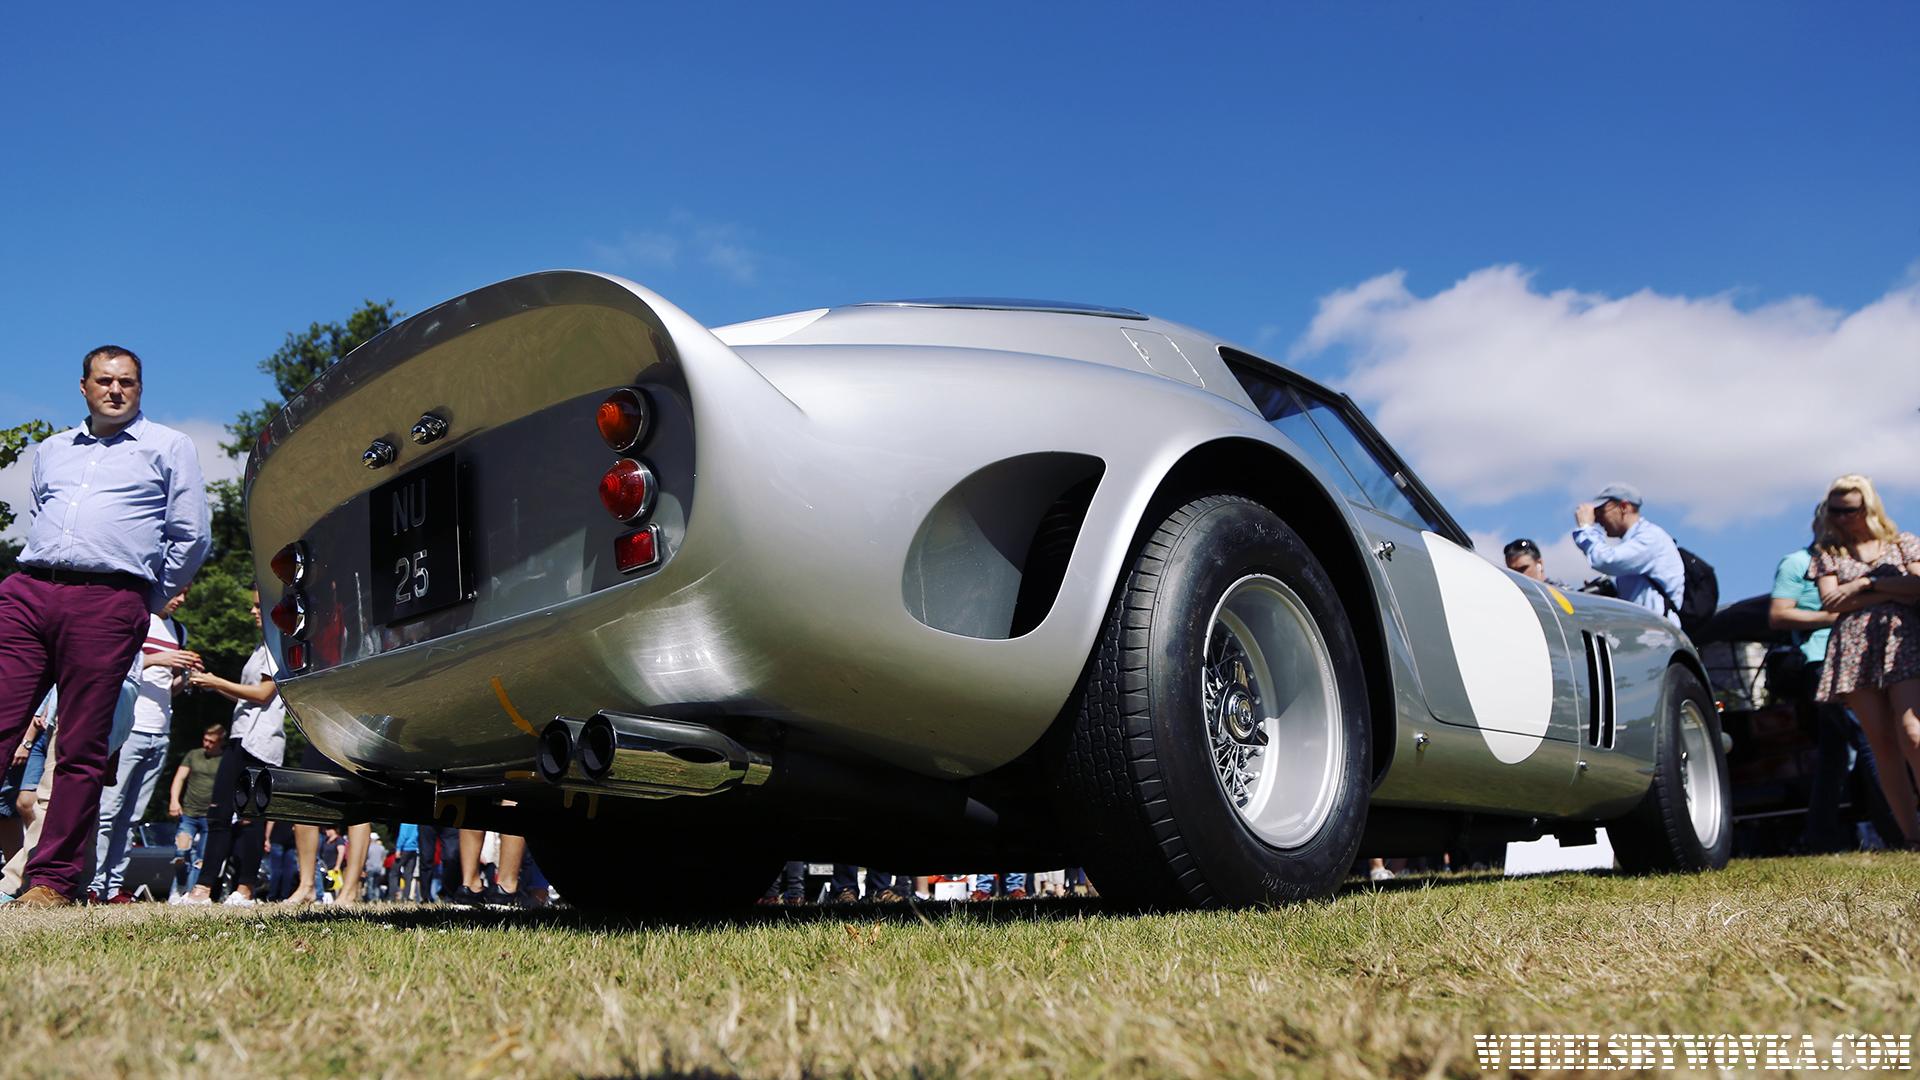 1964-ferrari-250-gto-sold-for-72m-dollars-by-wheelsbywovka-9